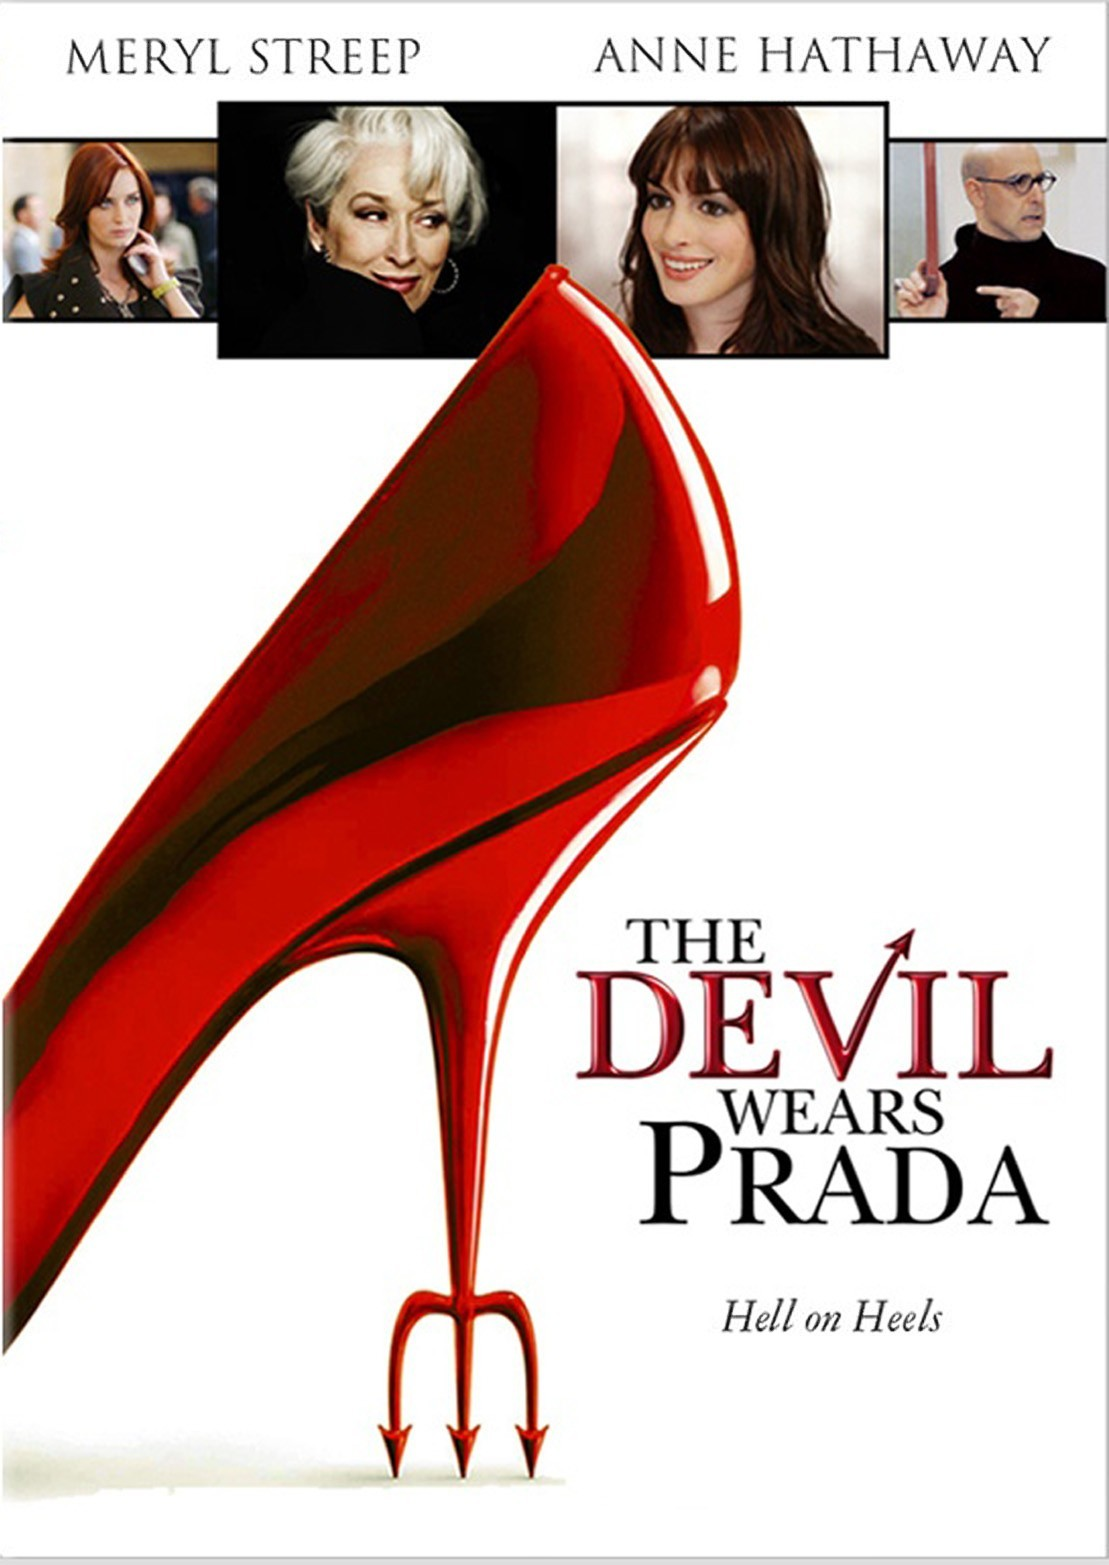 The wears devil prada sequel its happening